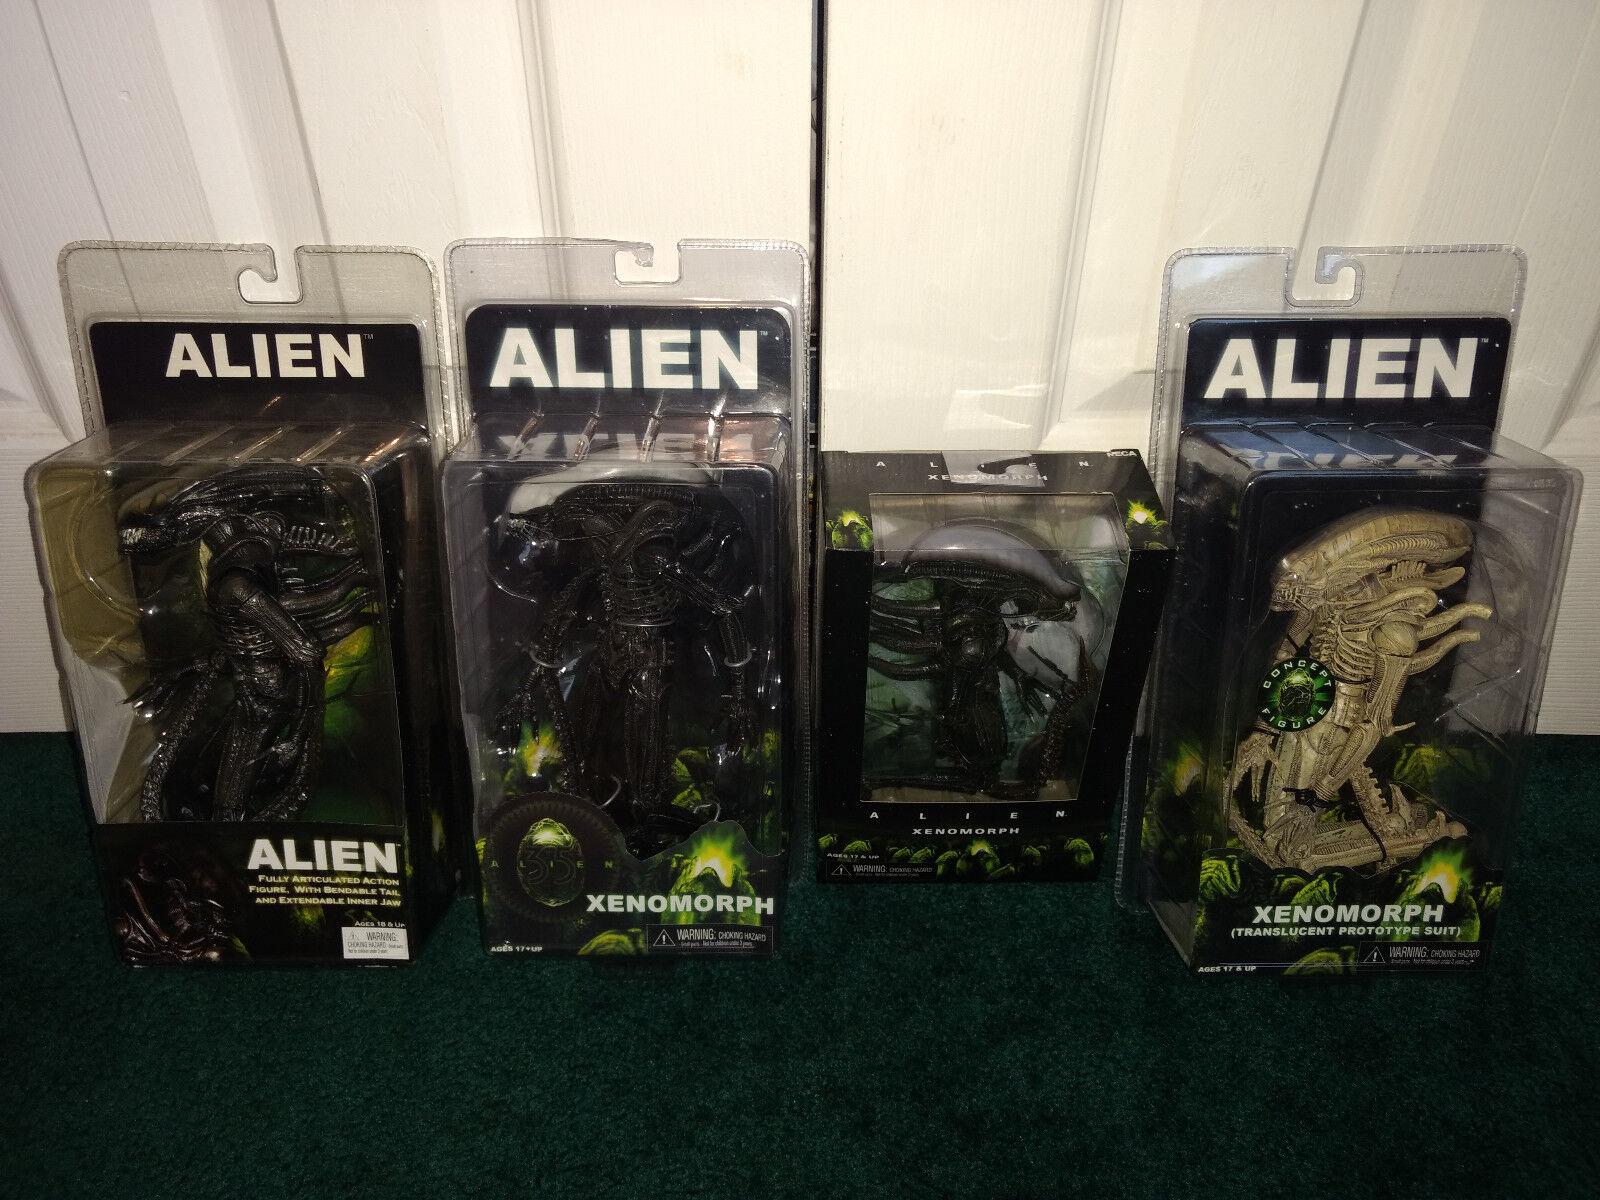 NECA Alien Xenomorph Lot ALL MISP  Alien + Xenomorph Boxed & Translucent Suit